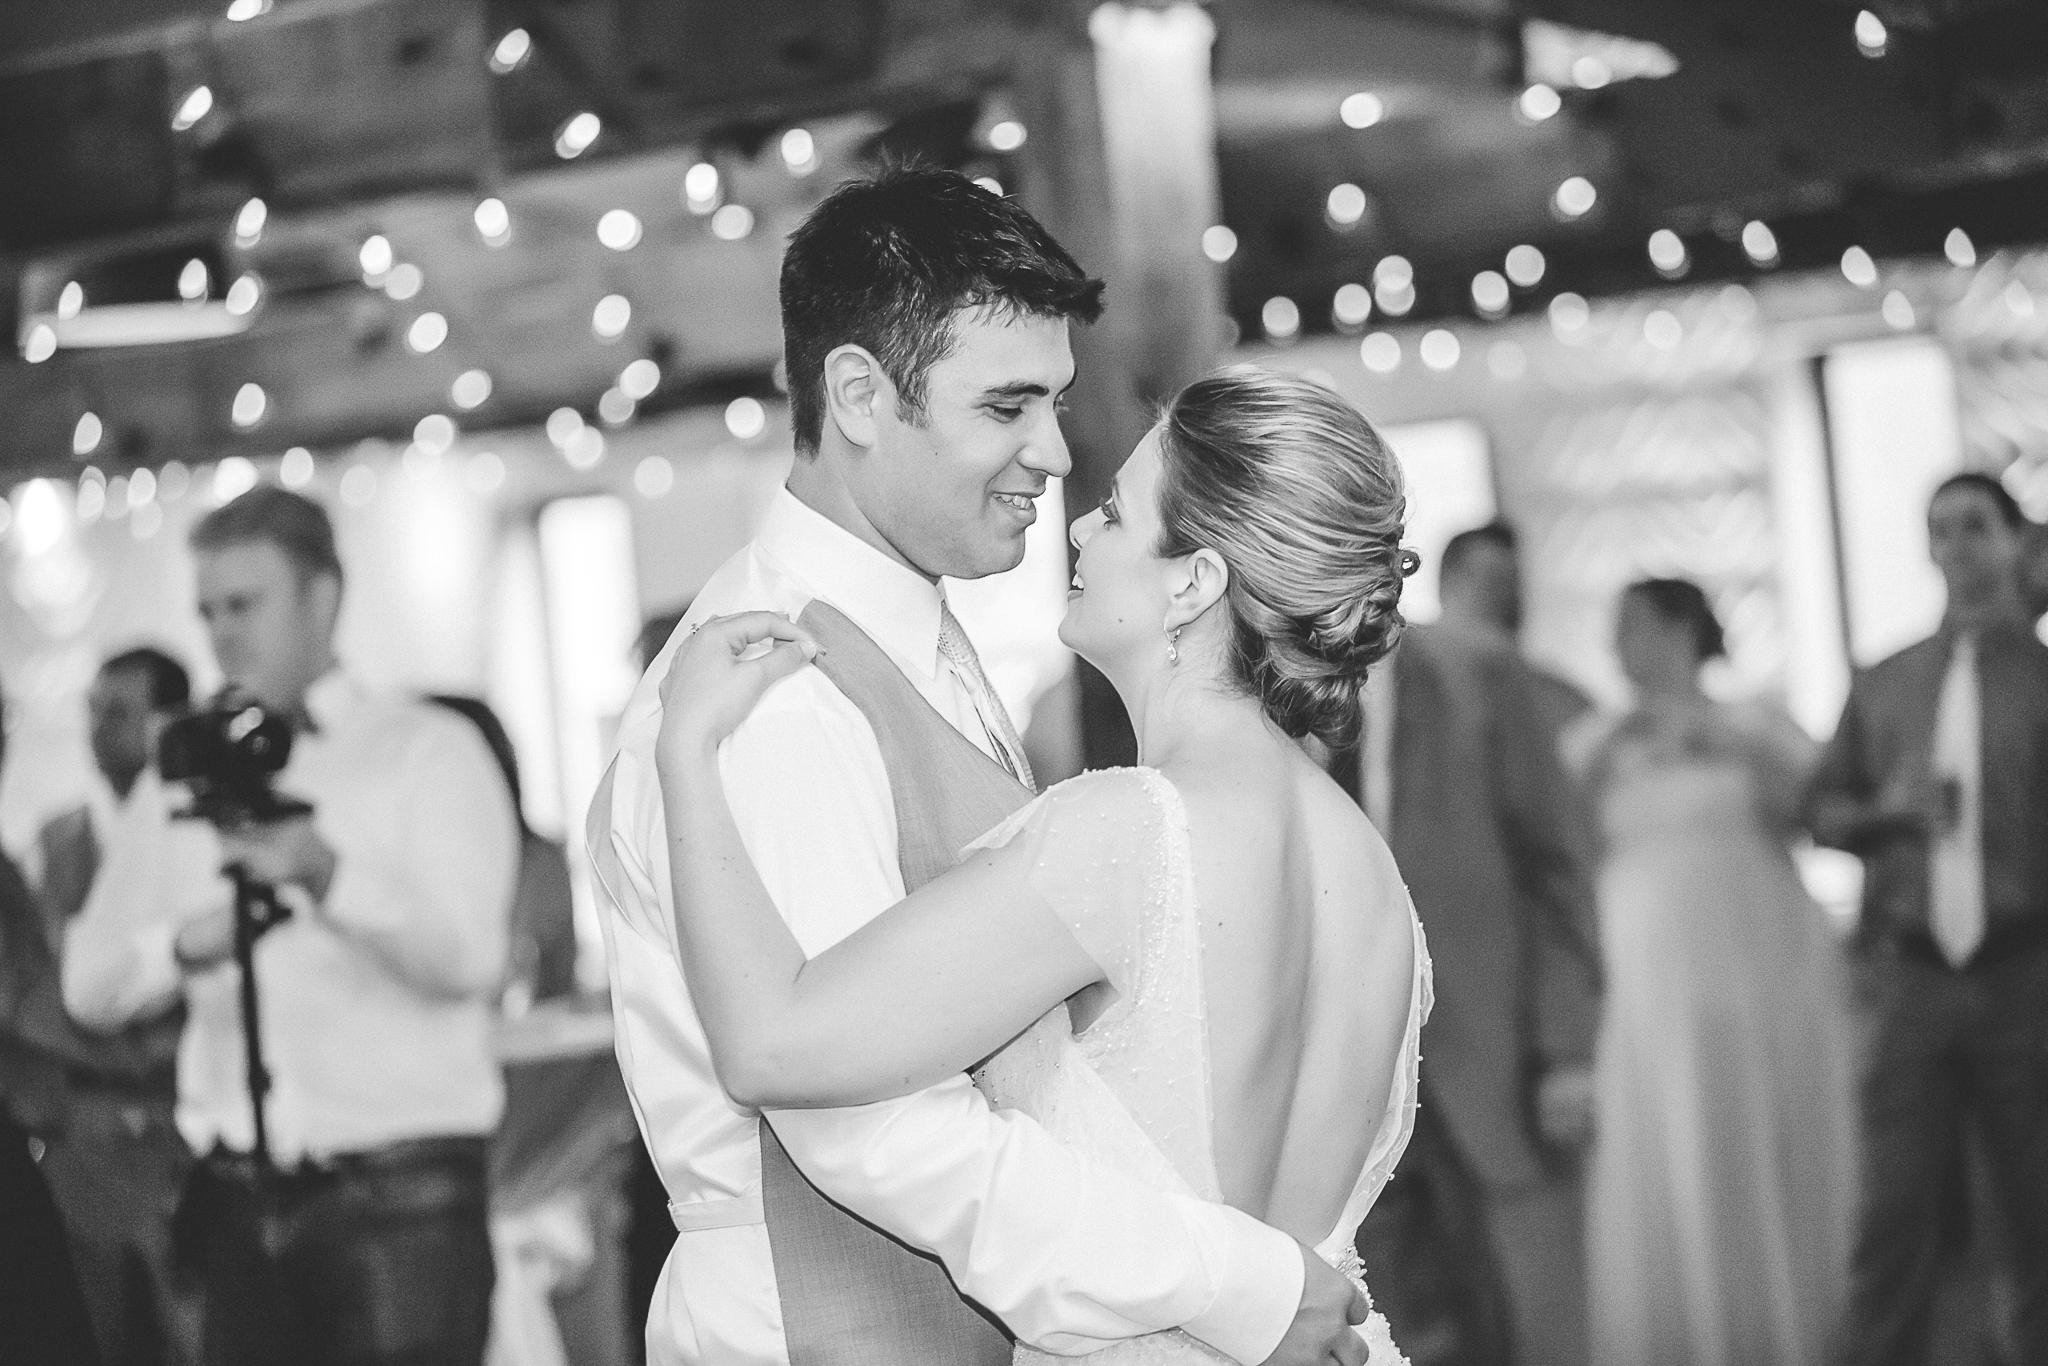 minneapolis event center wedding photographer-21.jpg